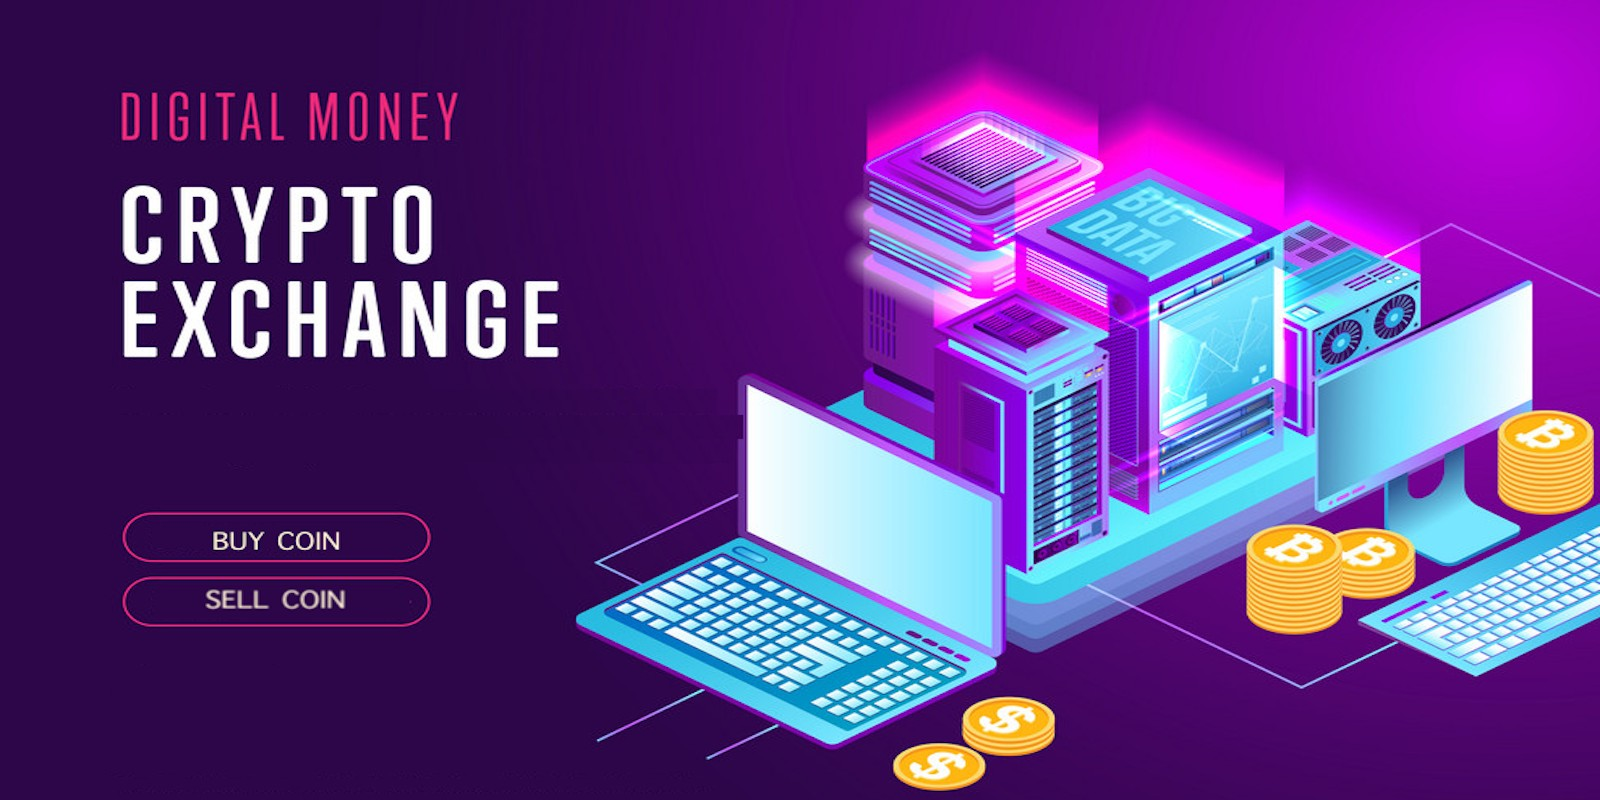 Digital Money Crypto Exchange System